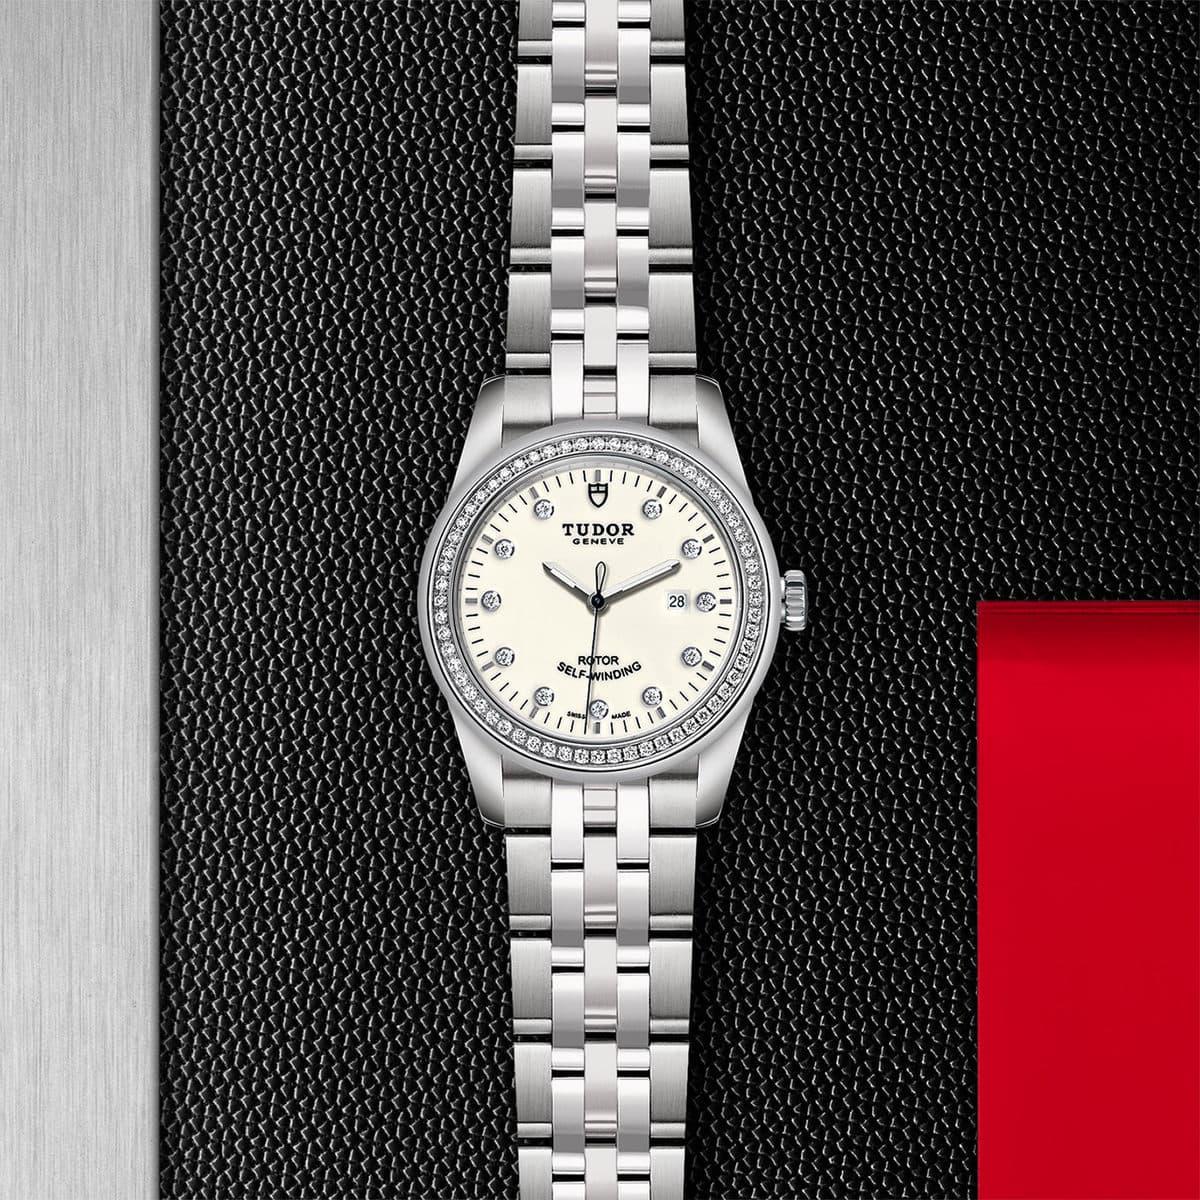 Tudor Glamour Date M53020-0074